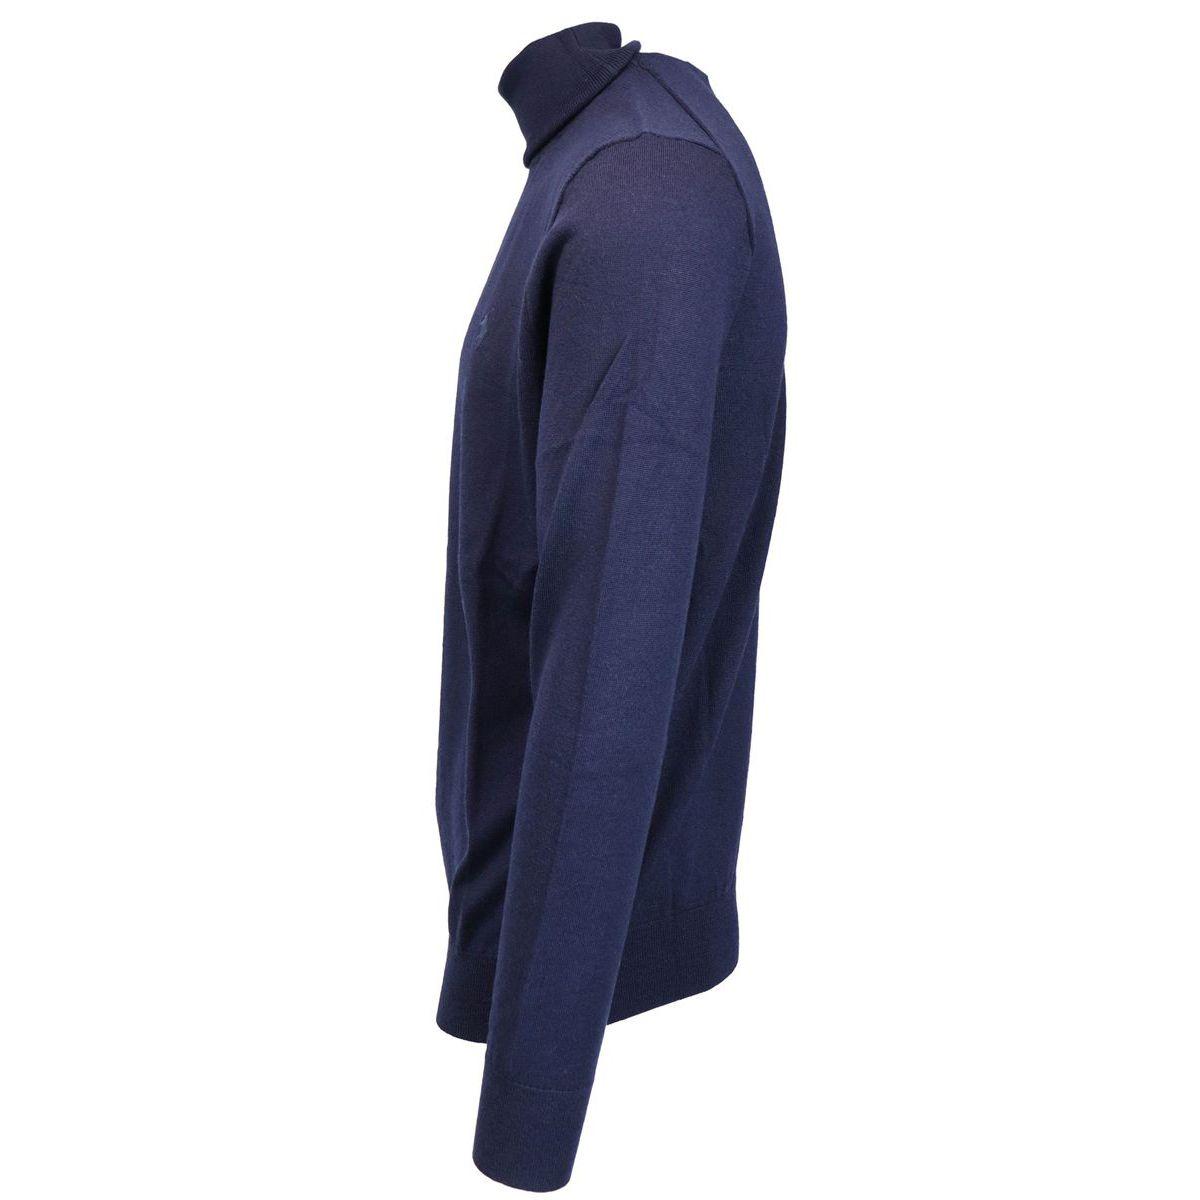 Wool turtleneck with logo Navy Polo Ralph Lauren